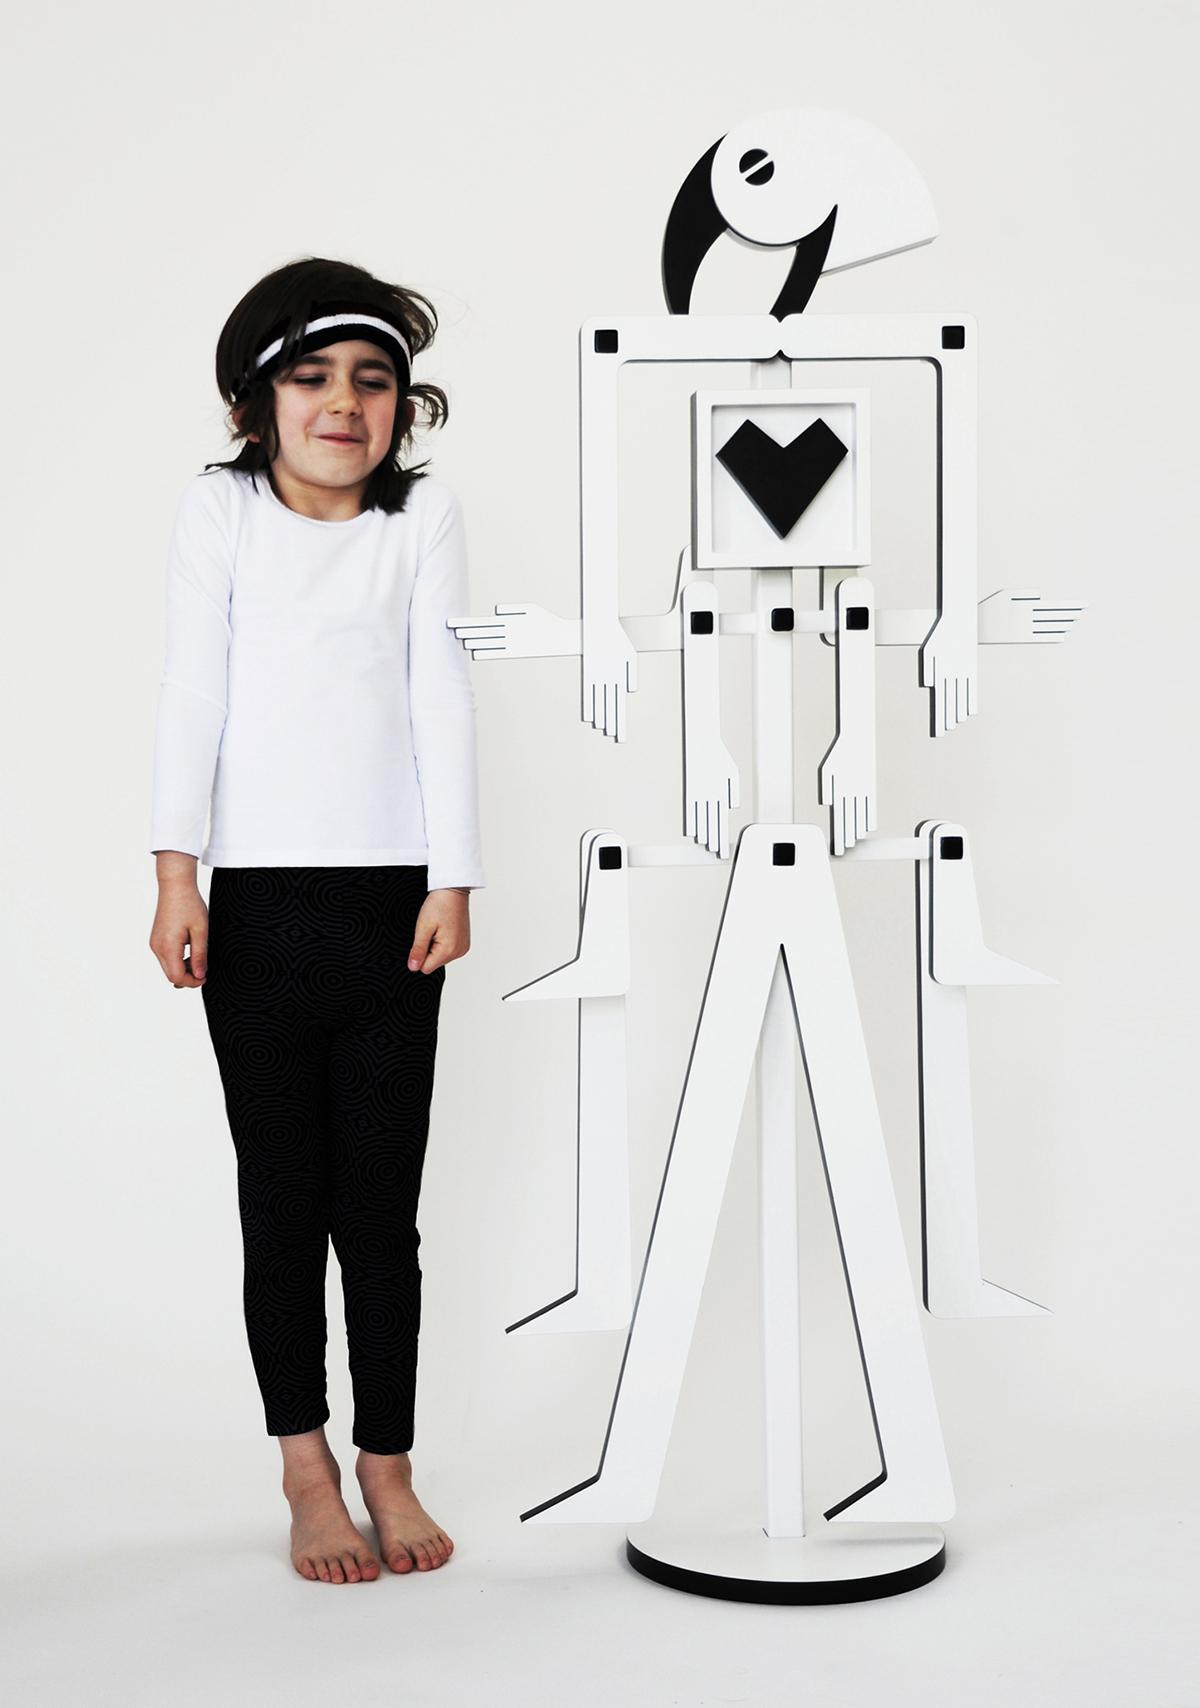 Crawl-chair-Materiallust-New-York-Design-Week-Collective-Childrens-Furniture-23.jpg